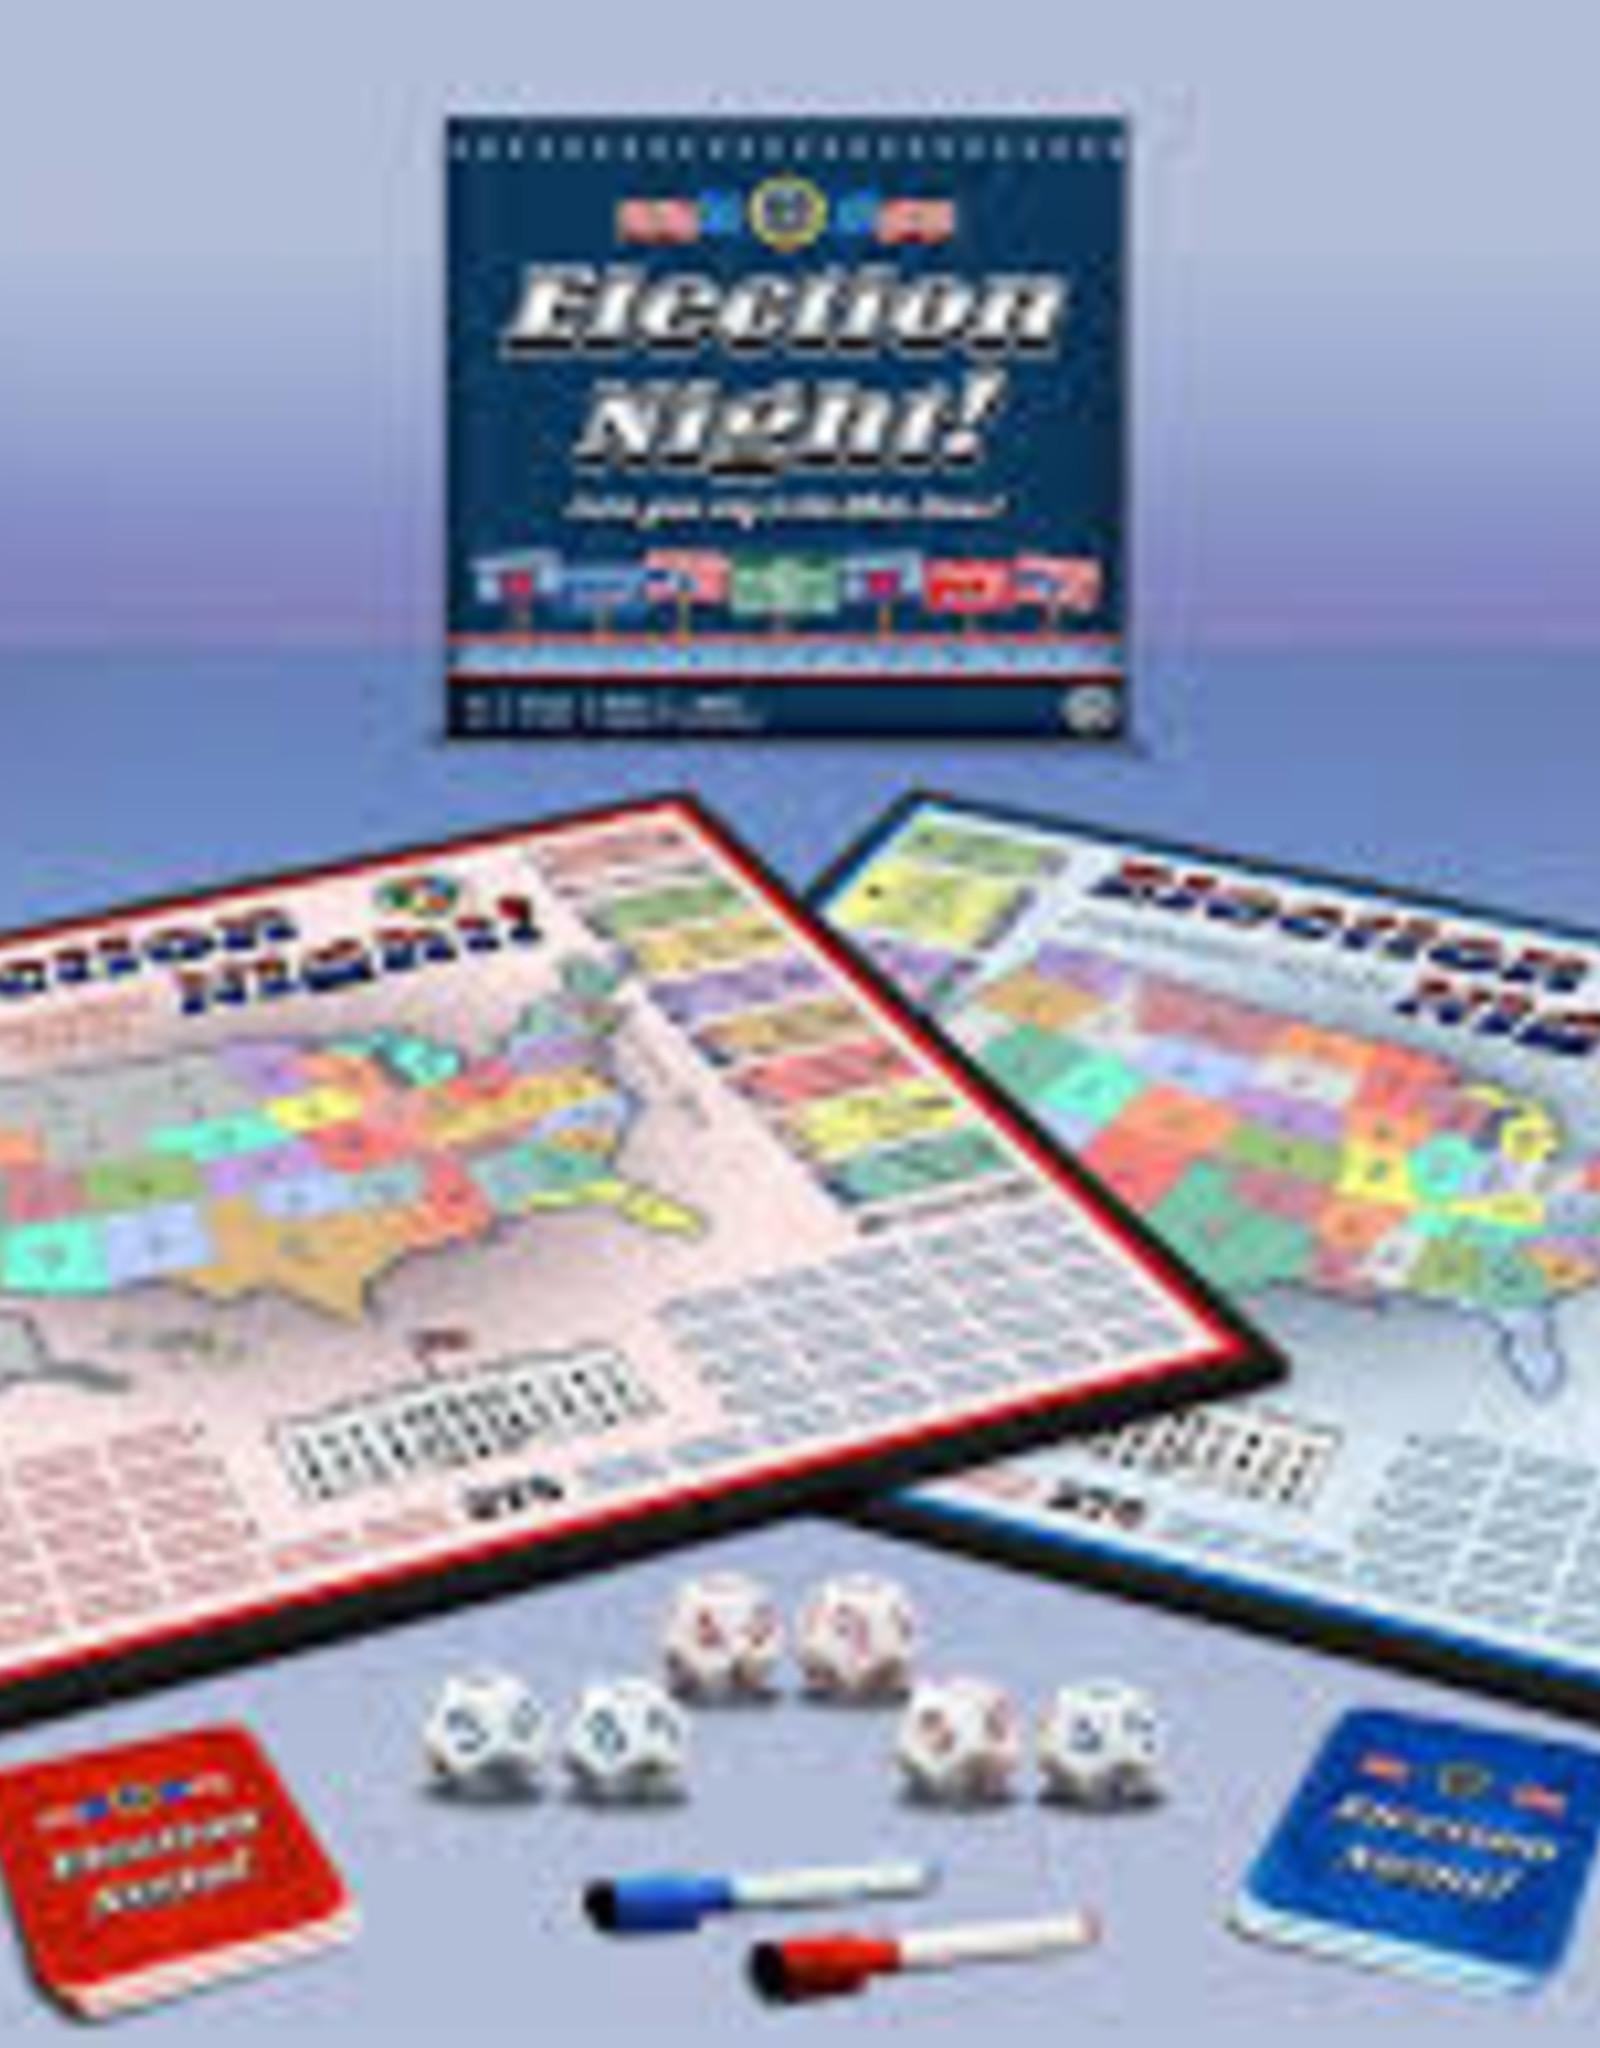 ELECTION NIGHT